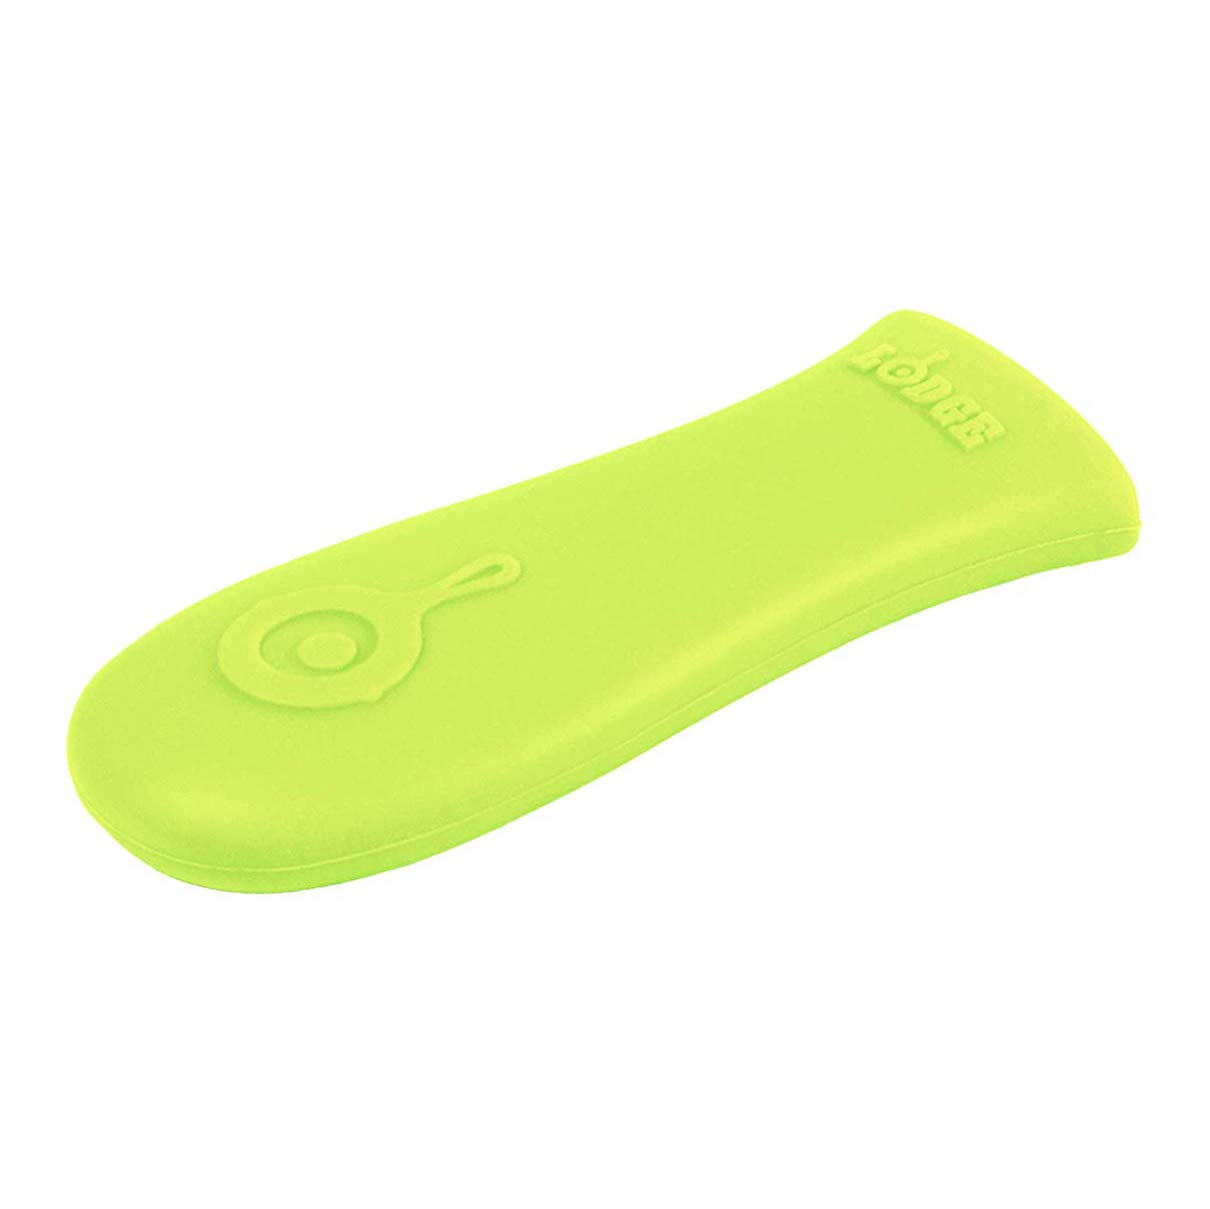 Lodge ASHH51MPK Silicone Hot Handle Holder, 1 EA, Green